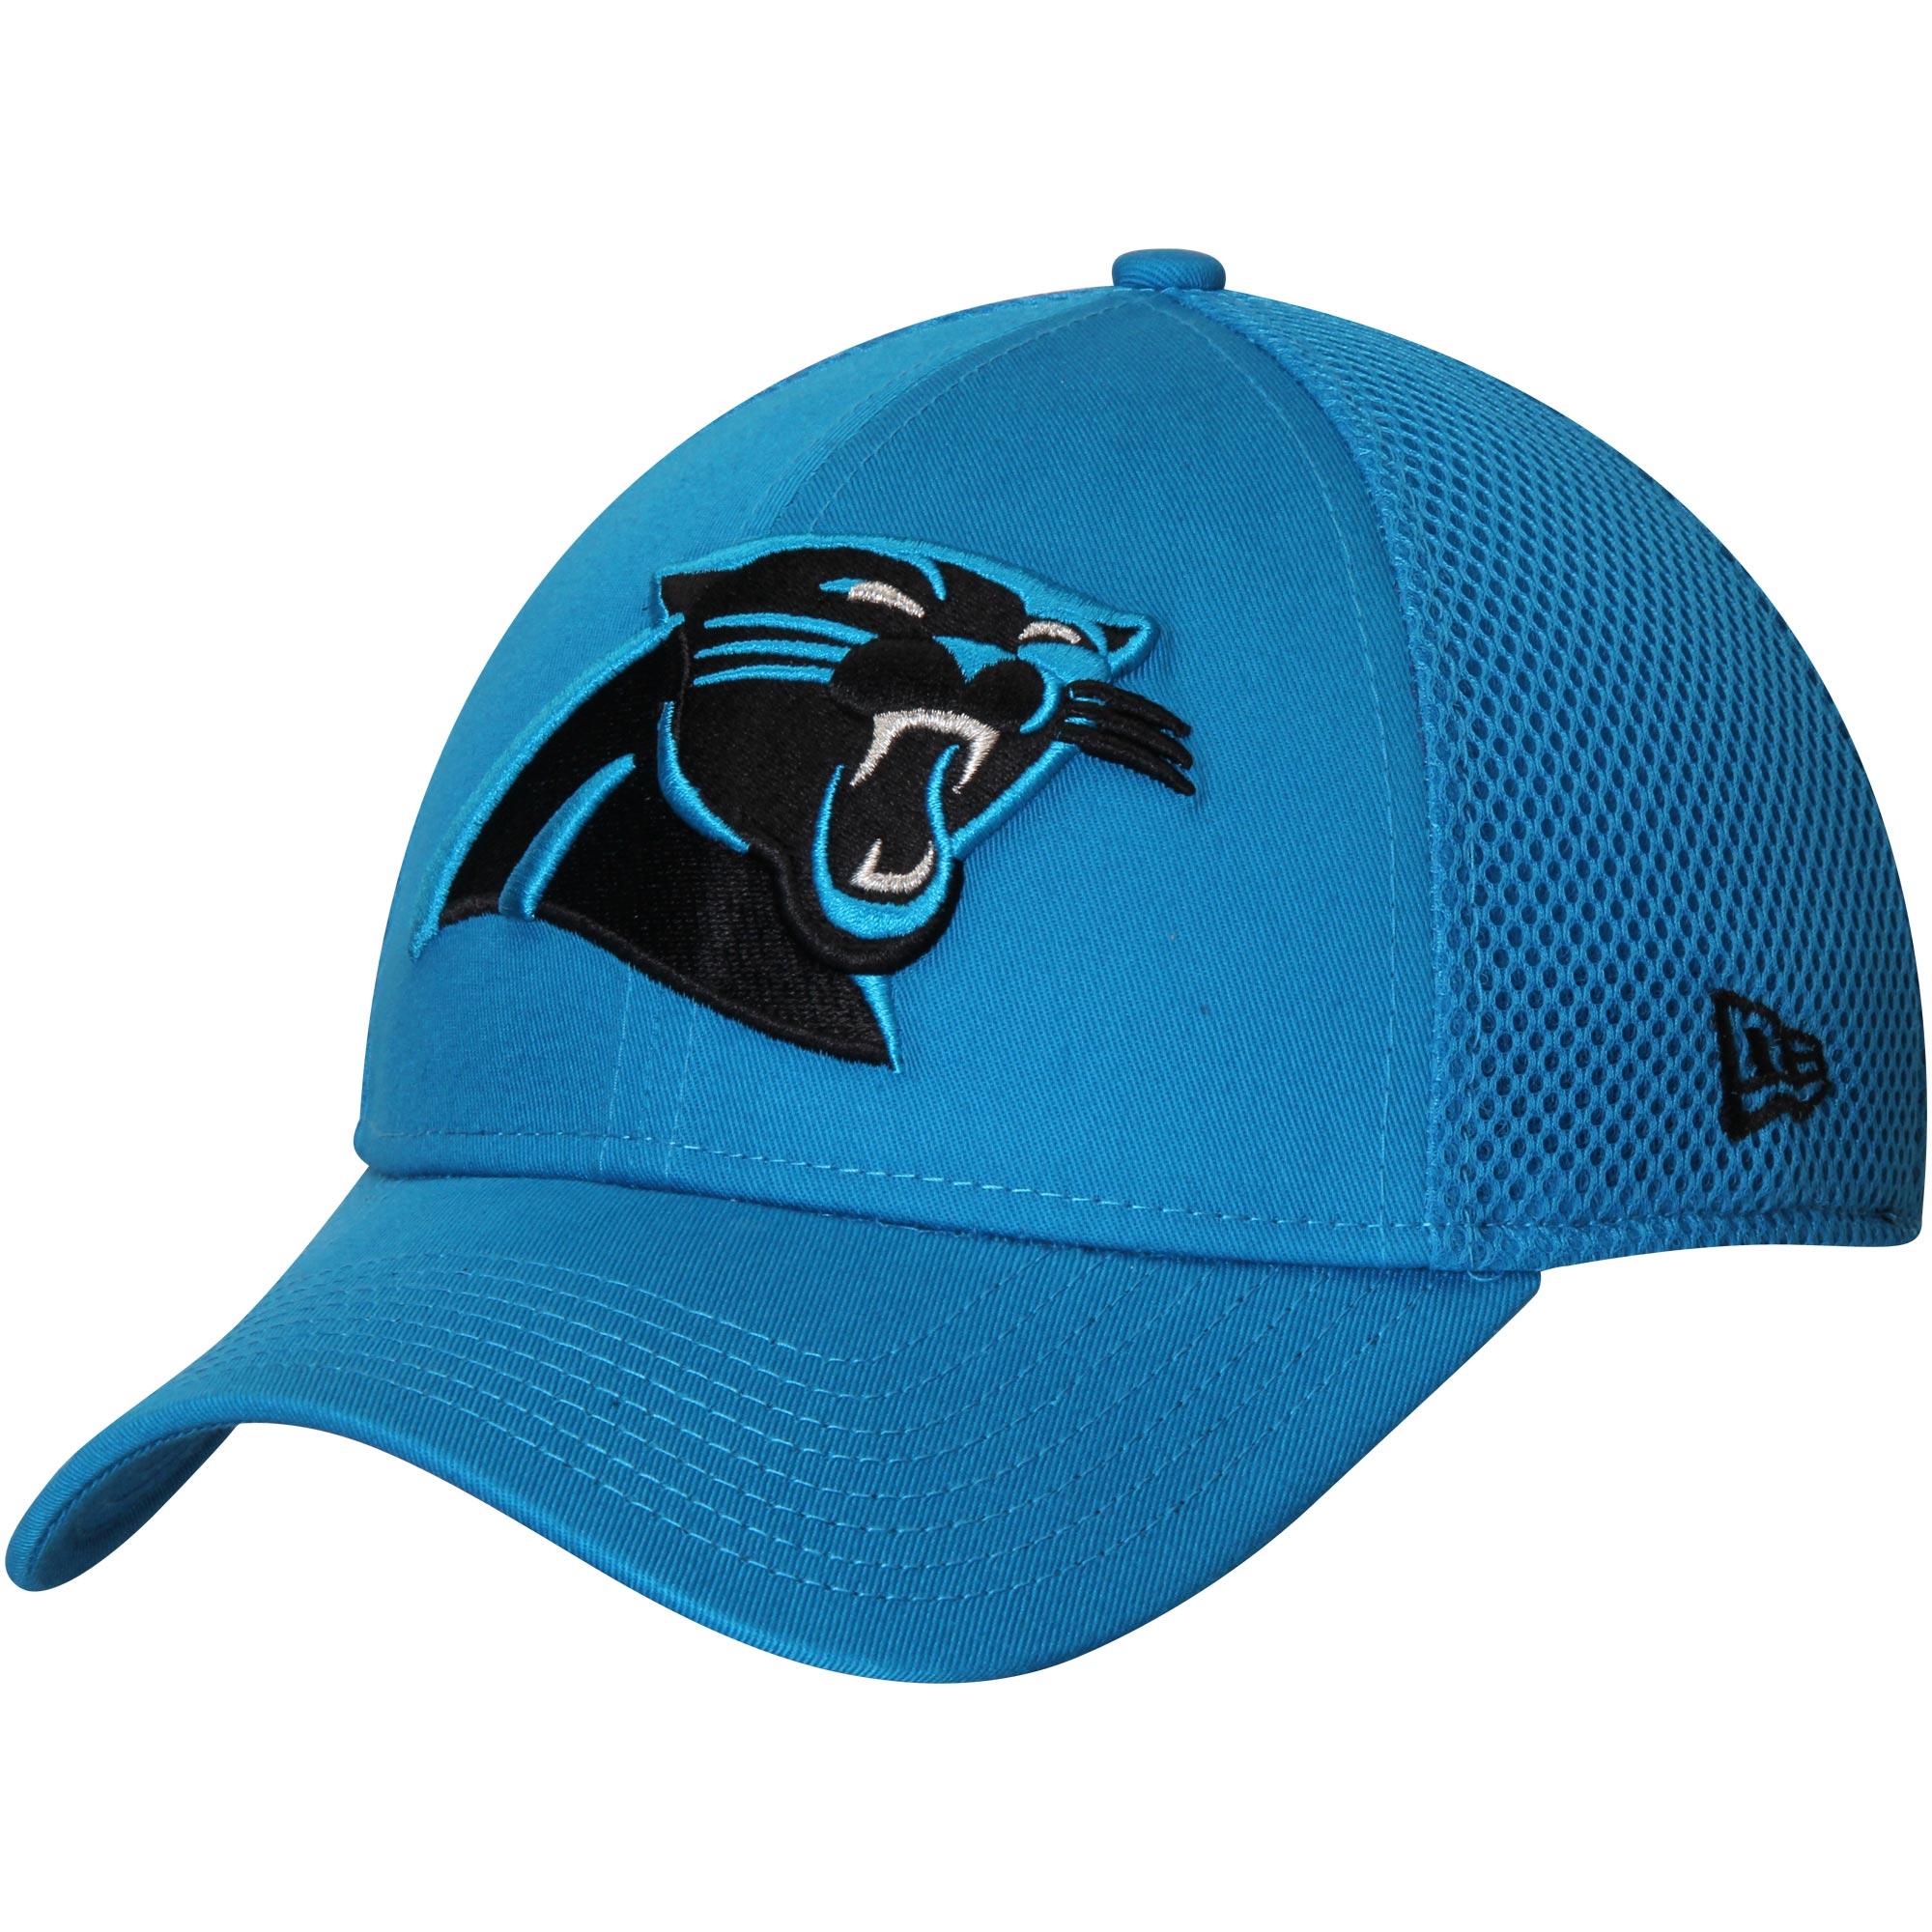 Carolina Panthers New Era Mega Team Neo 39THIRTY Flex Hat - Blue